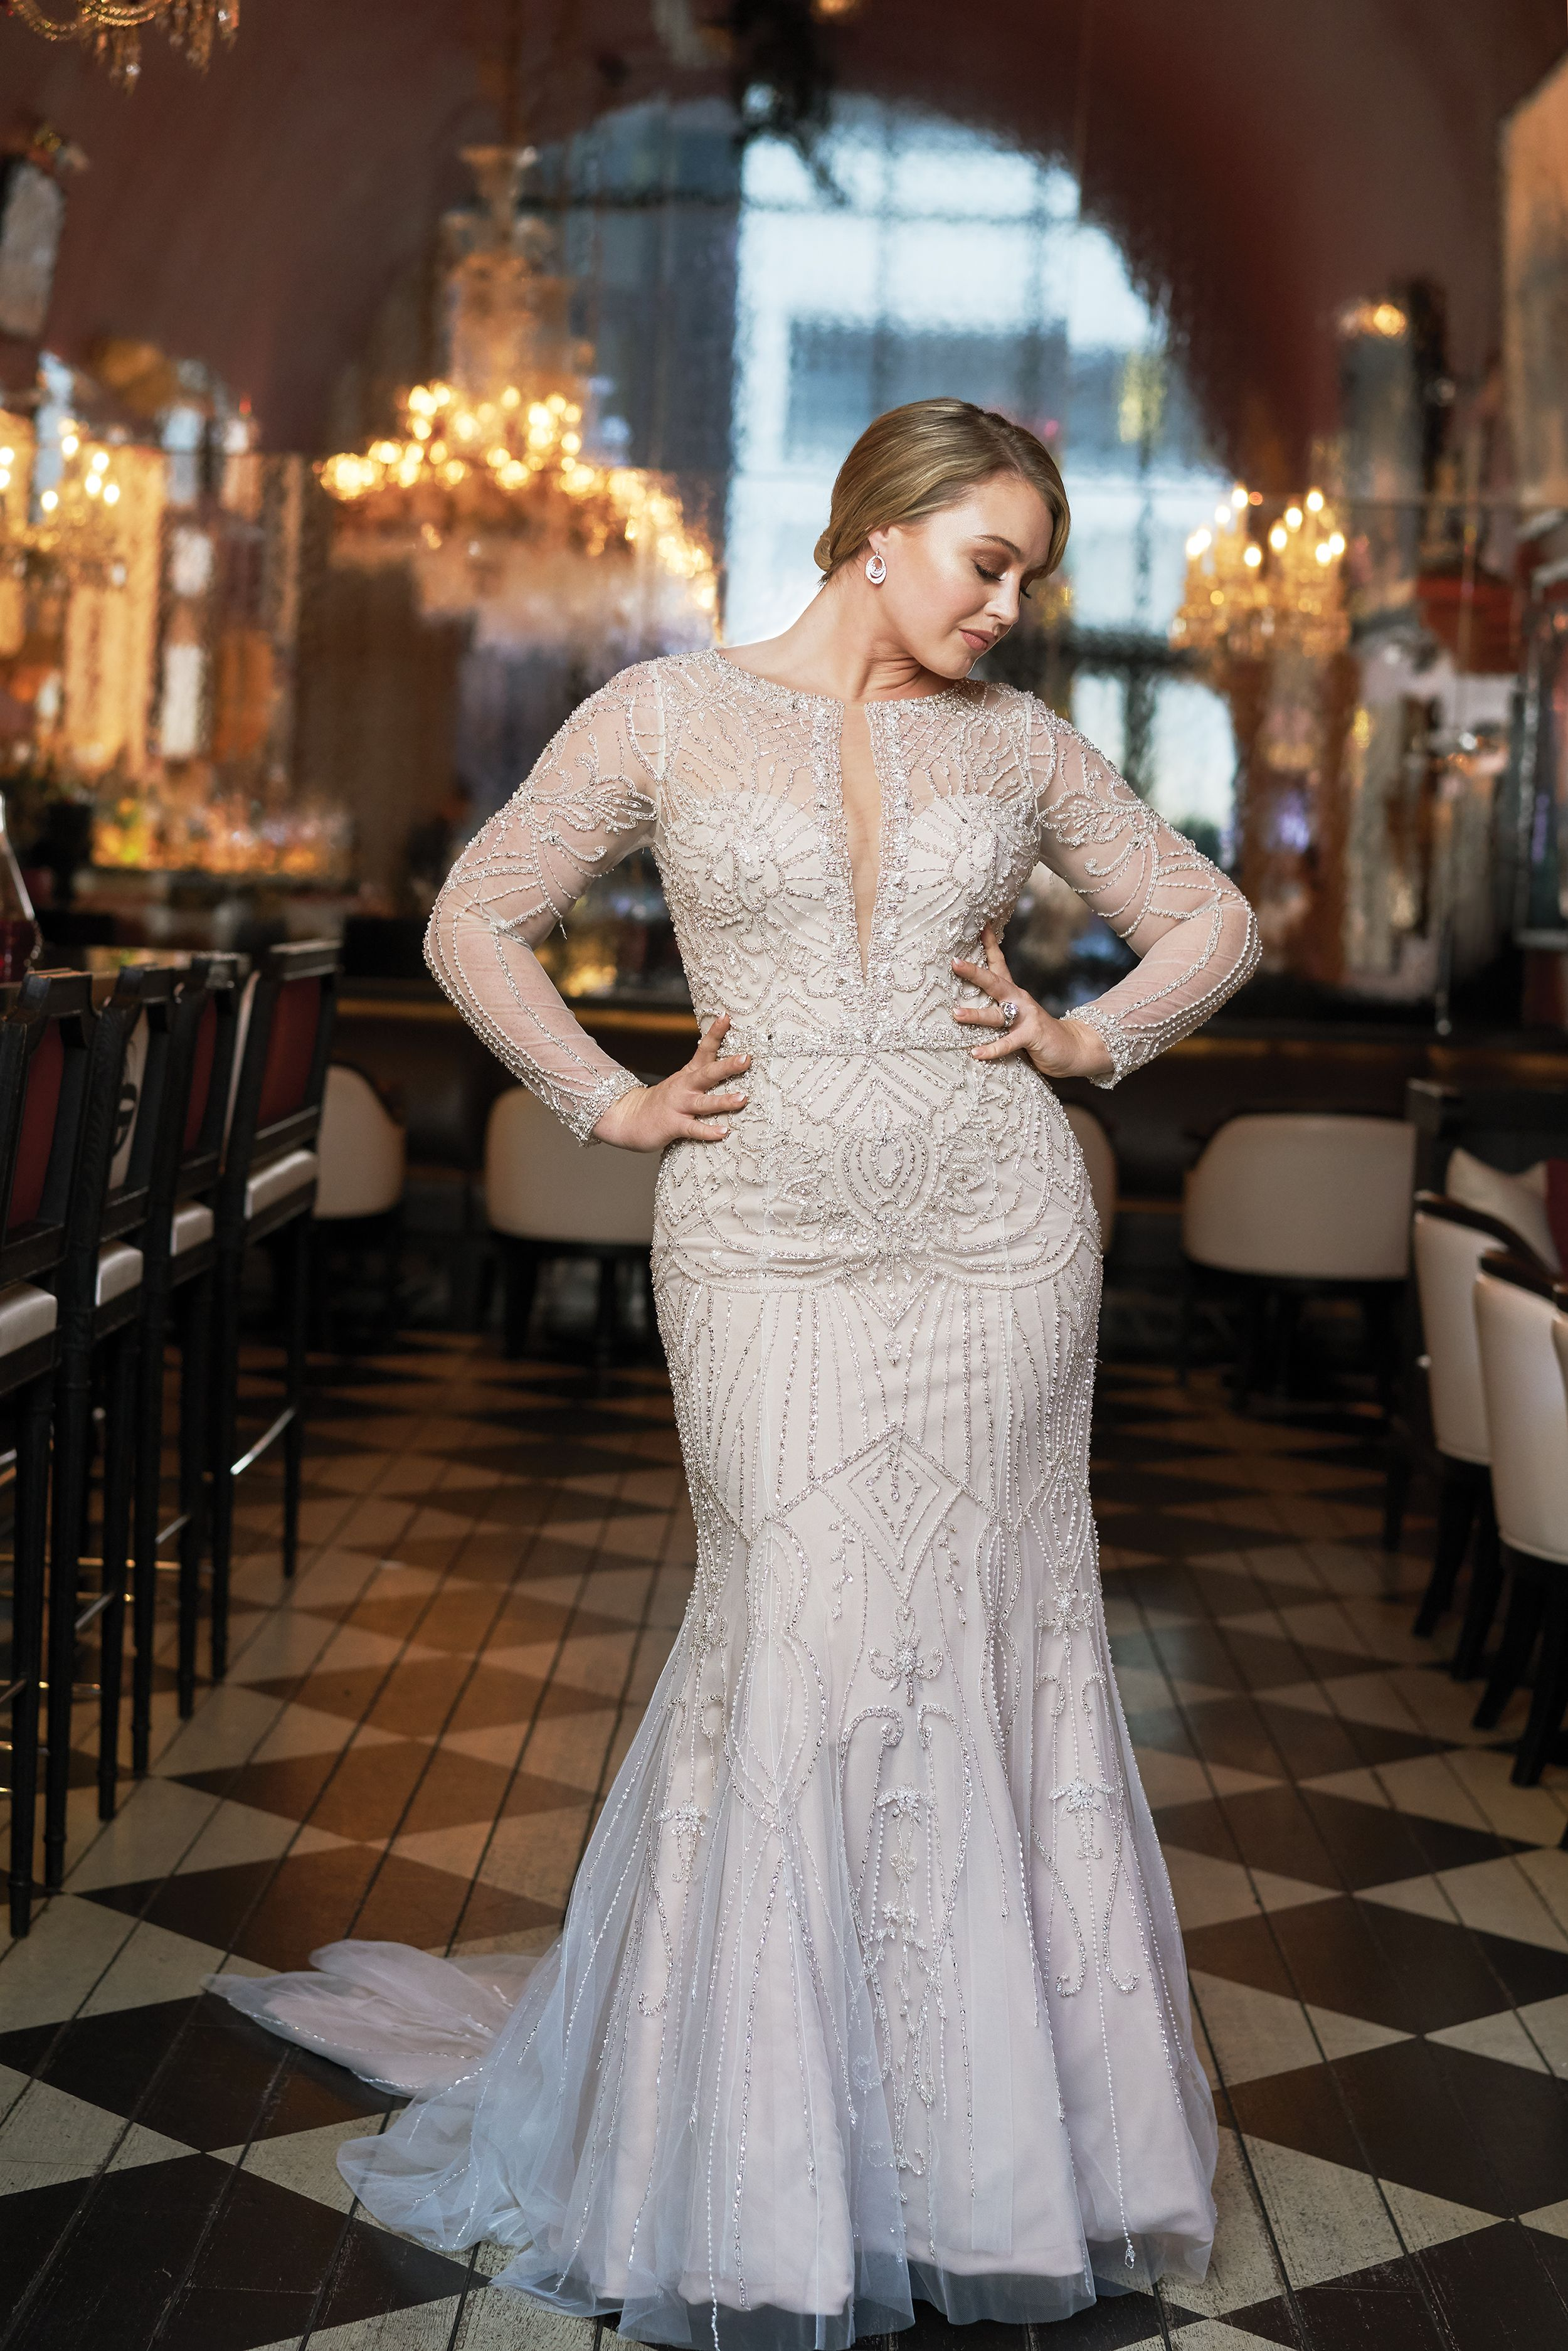 6bcbcbf2098d Be You Campaign By Justin Alexander | Wedding Dress & Bridal Fashion ...